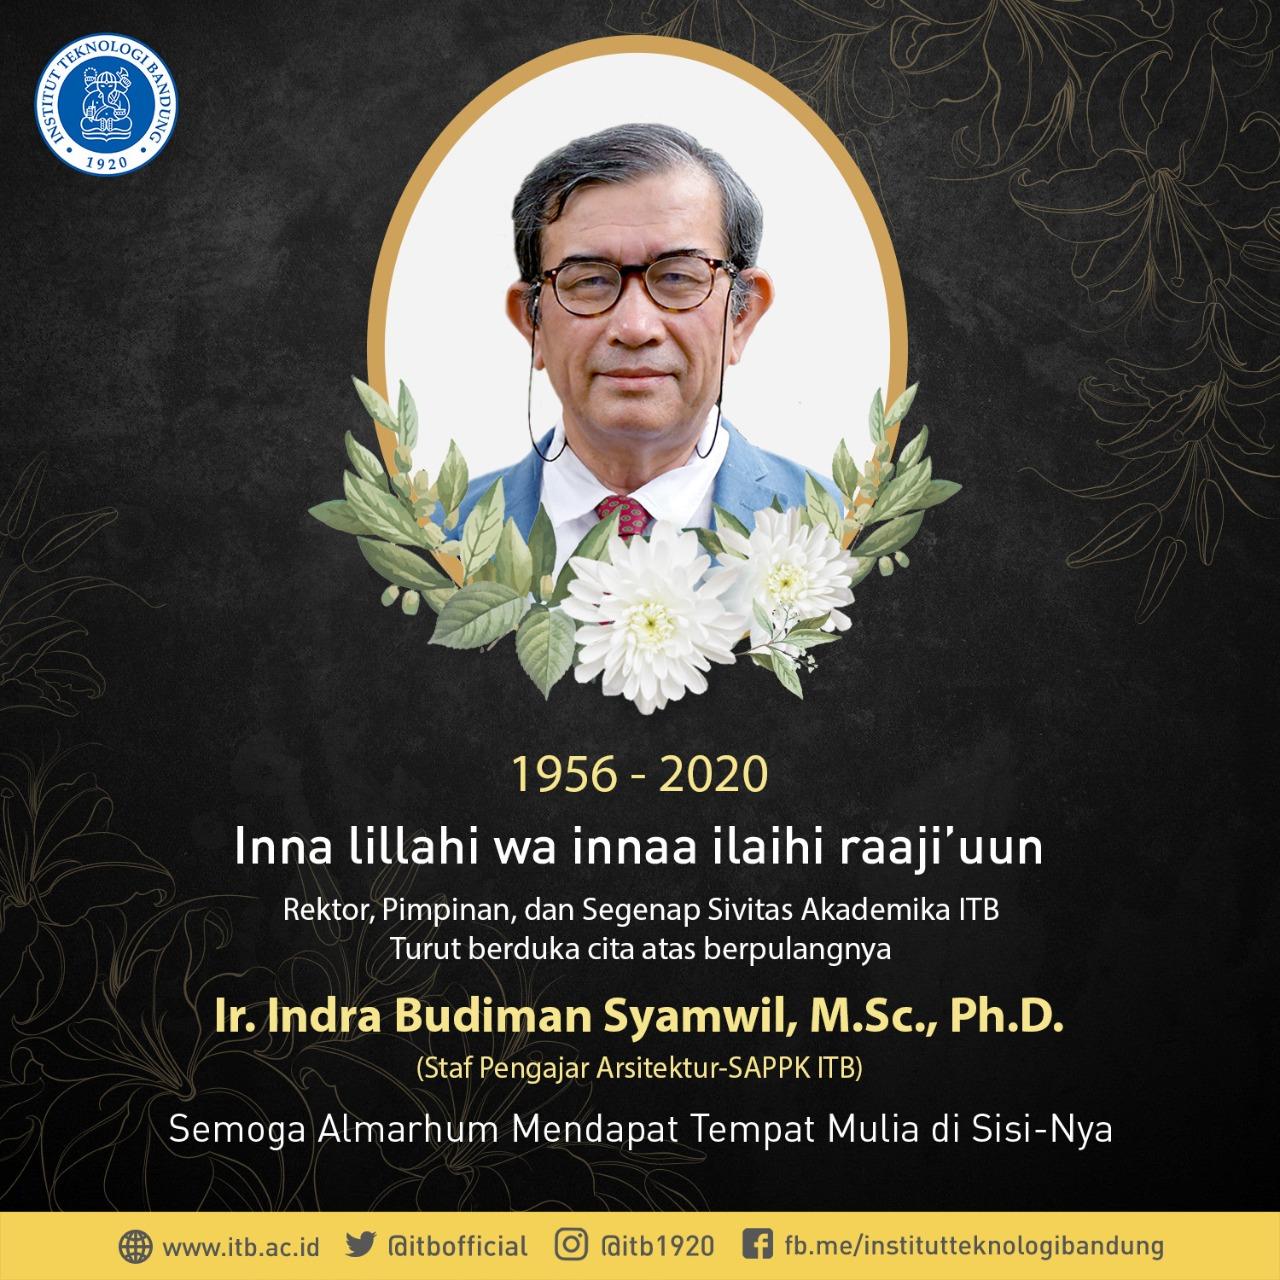 Kabar Duka – Ir. Indra Budiman Syamwil, M.Sc., Ph.D.